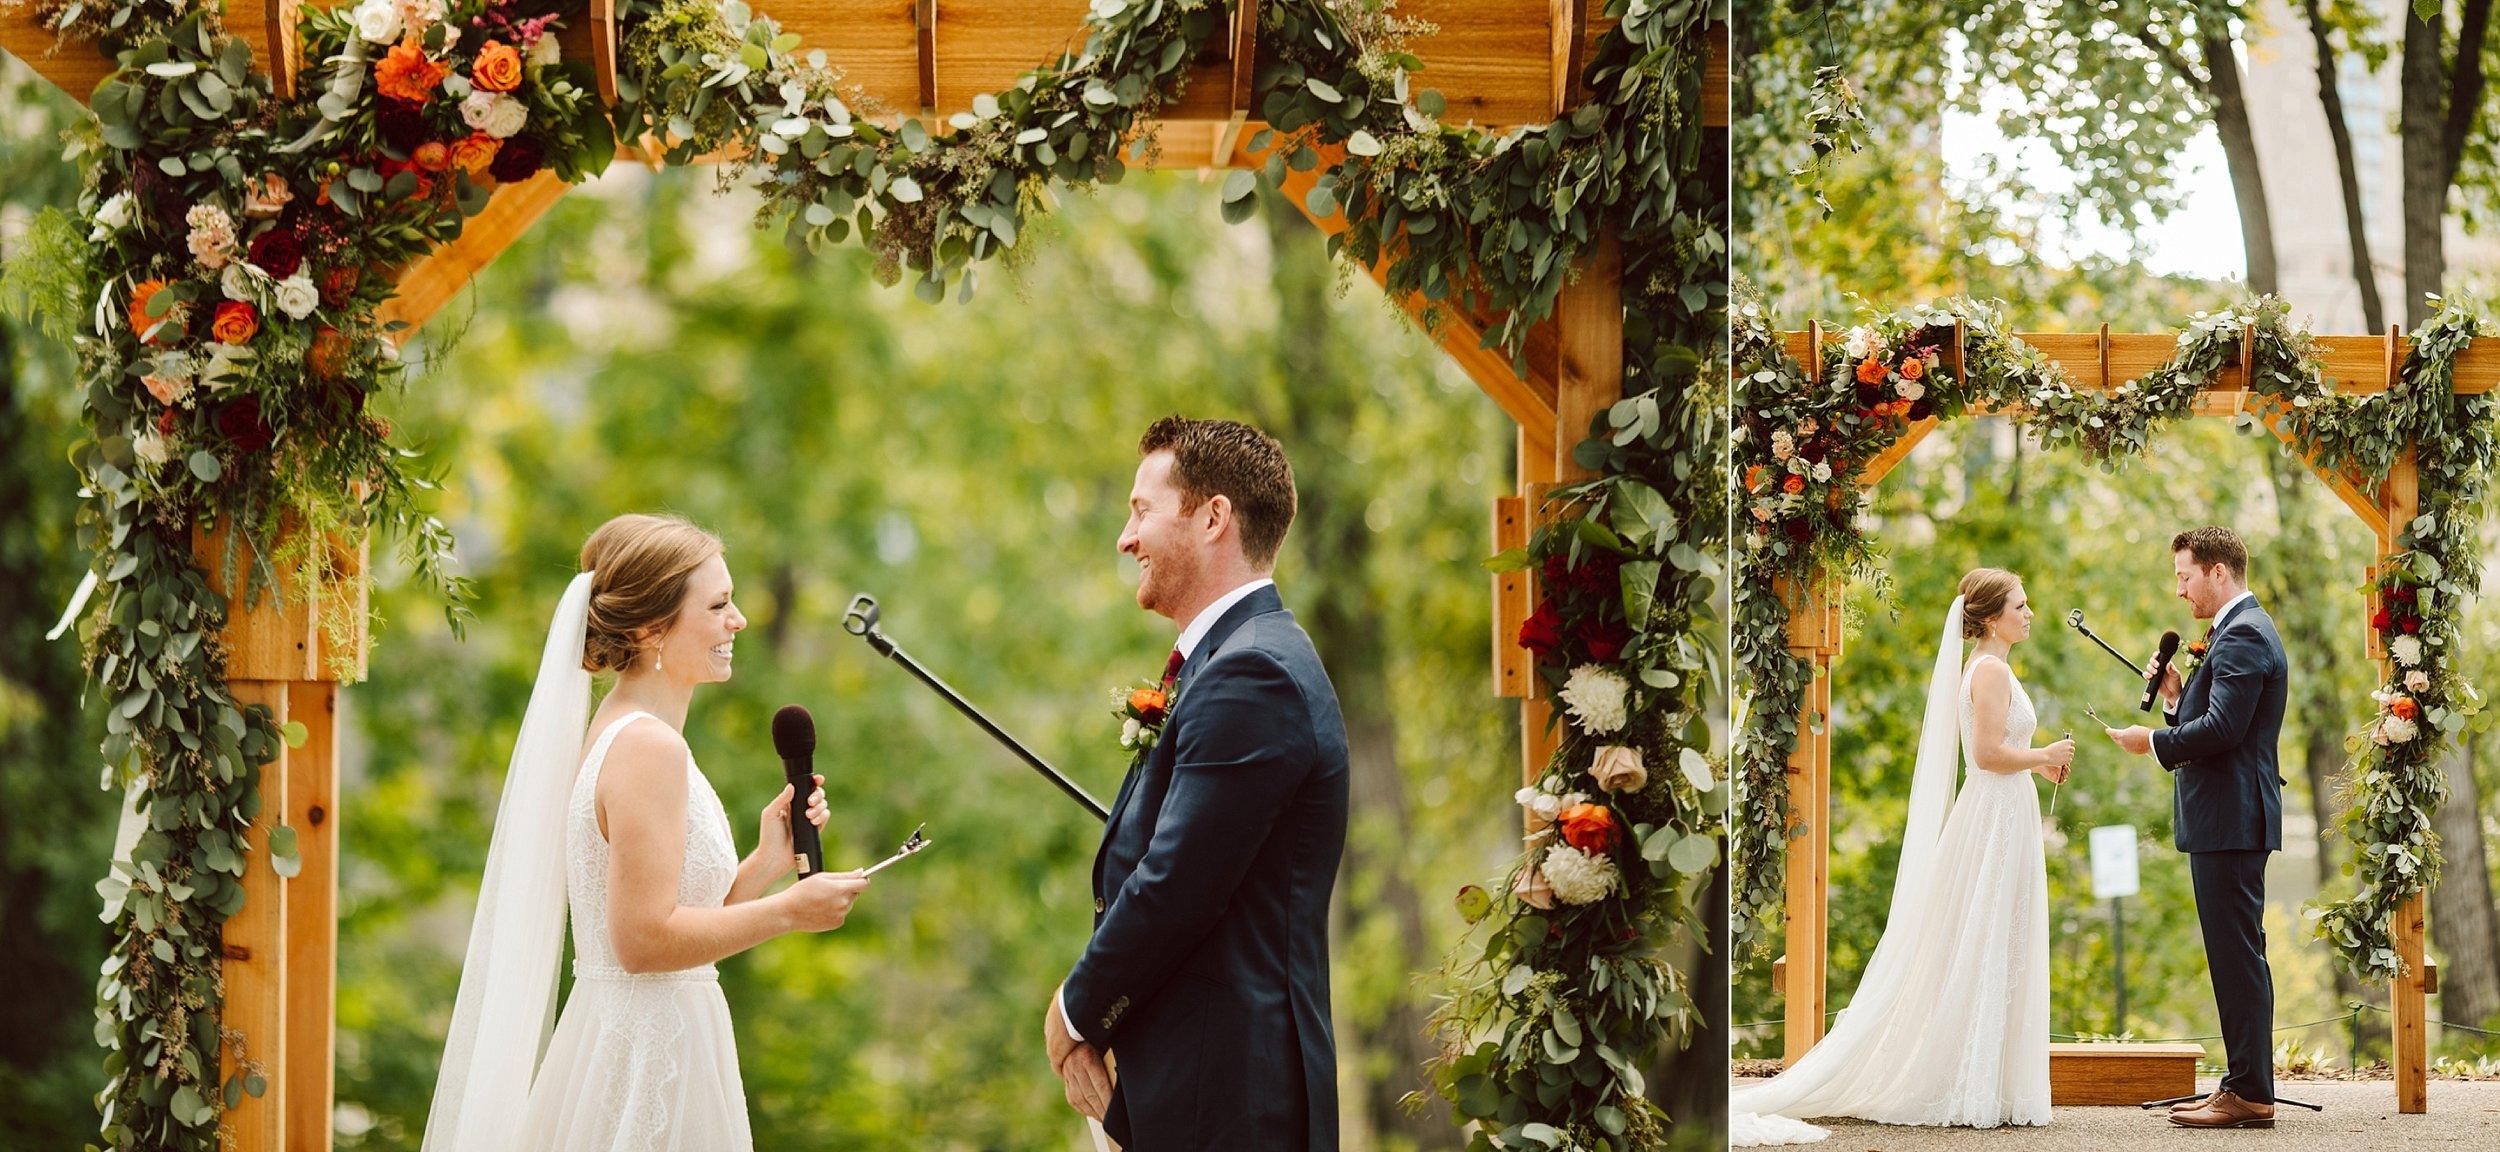 Nicollet-Island-Pavilion-Minneapolis-September-Coral-Navy-Wedding-110.jpg